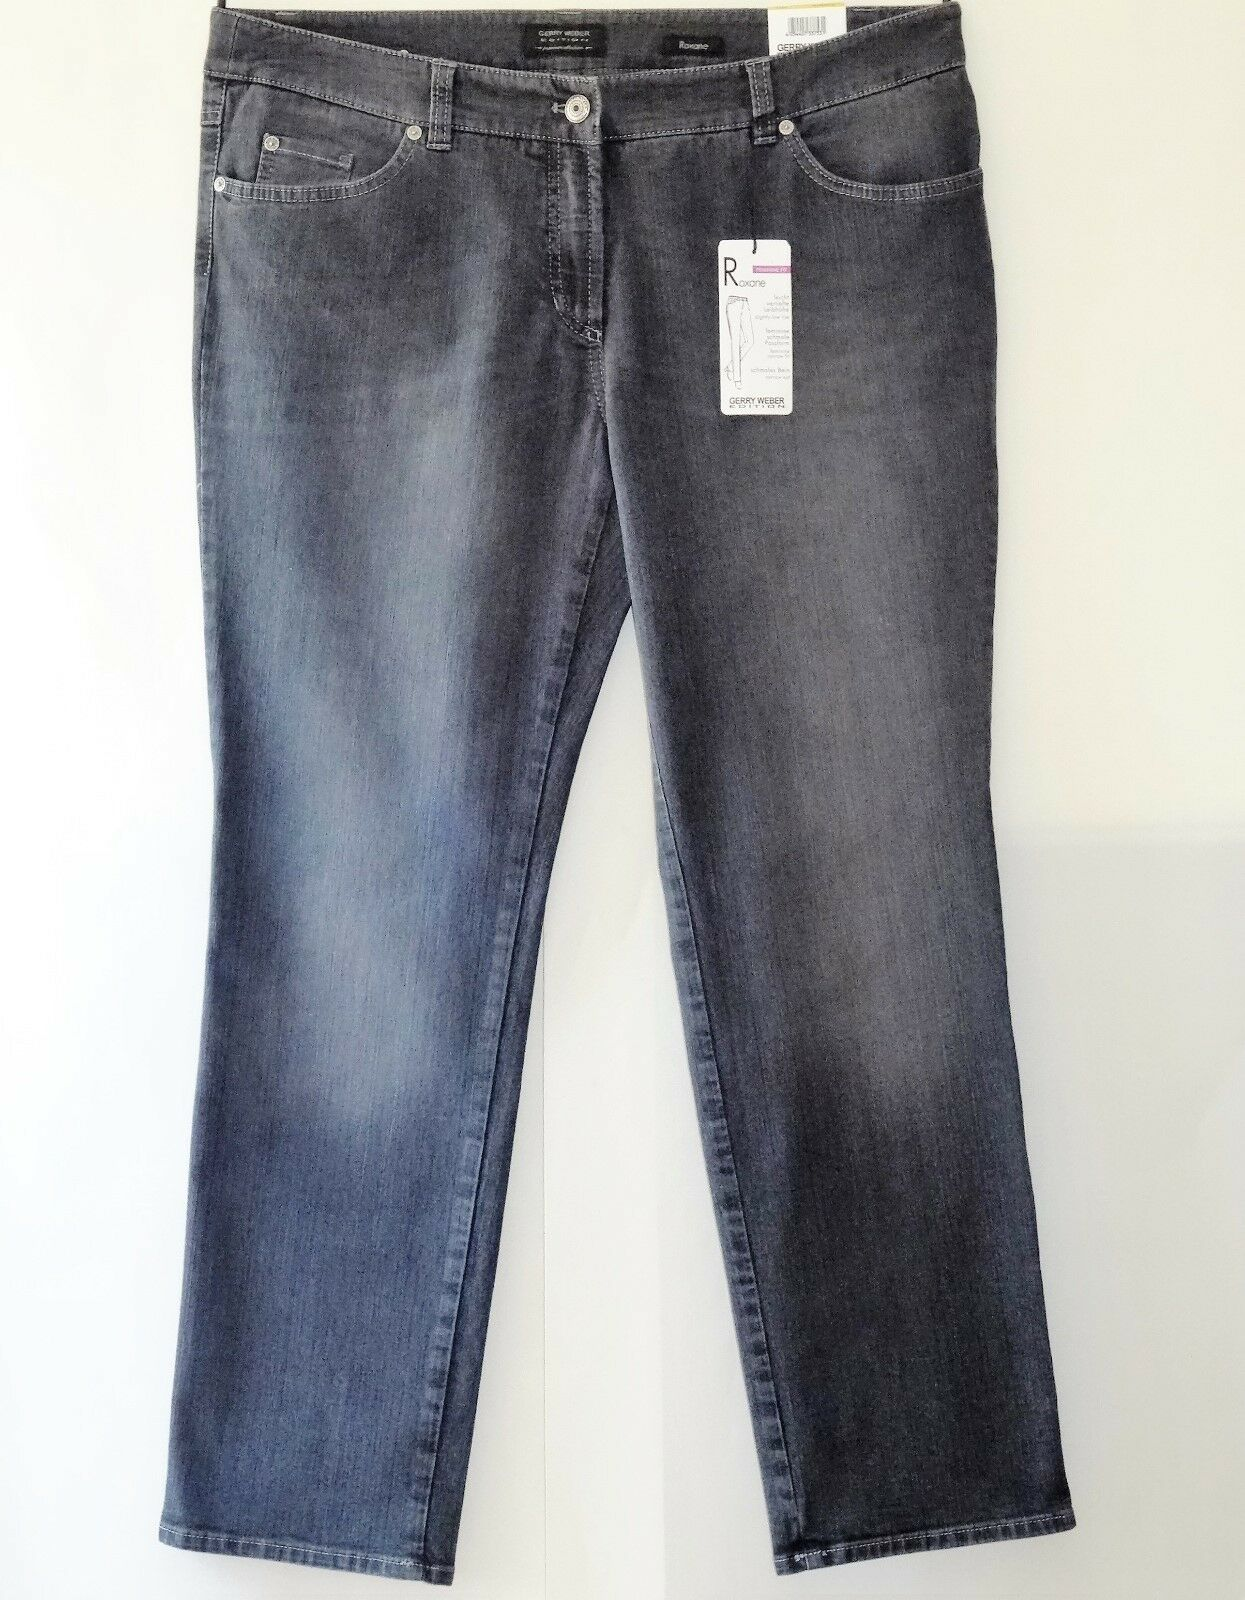 Edition by Gerry Weber Jeans Gr. 48 ROXANE mit Stretch Damenjeans Hose Damenhose